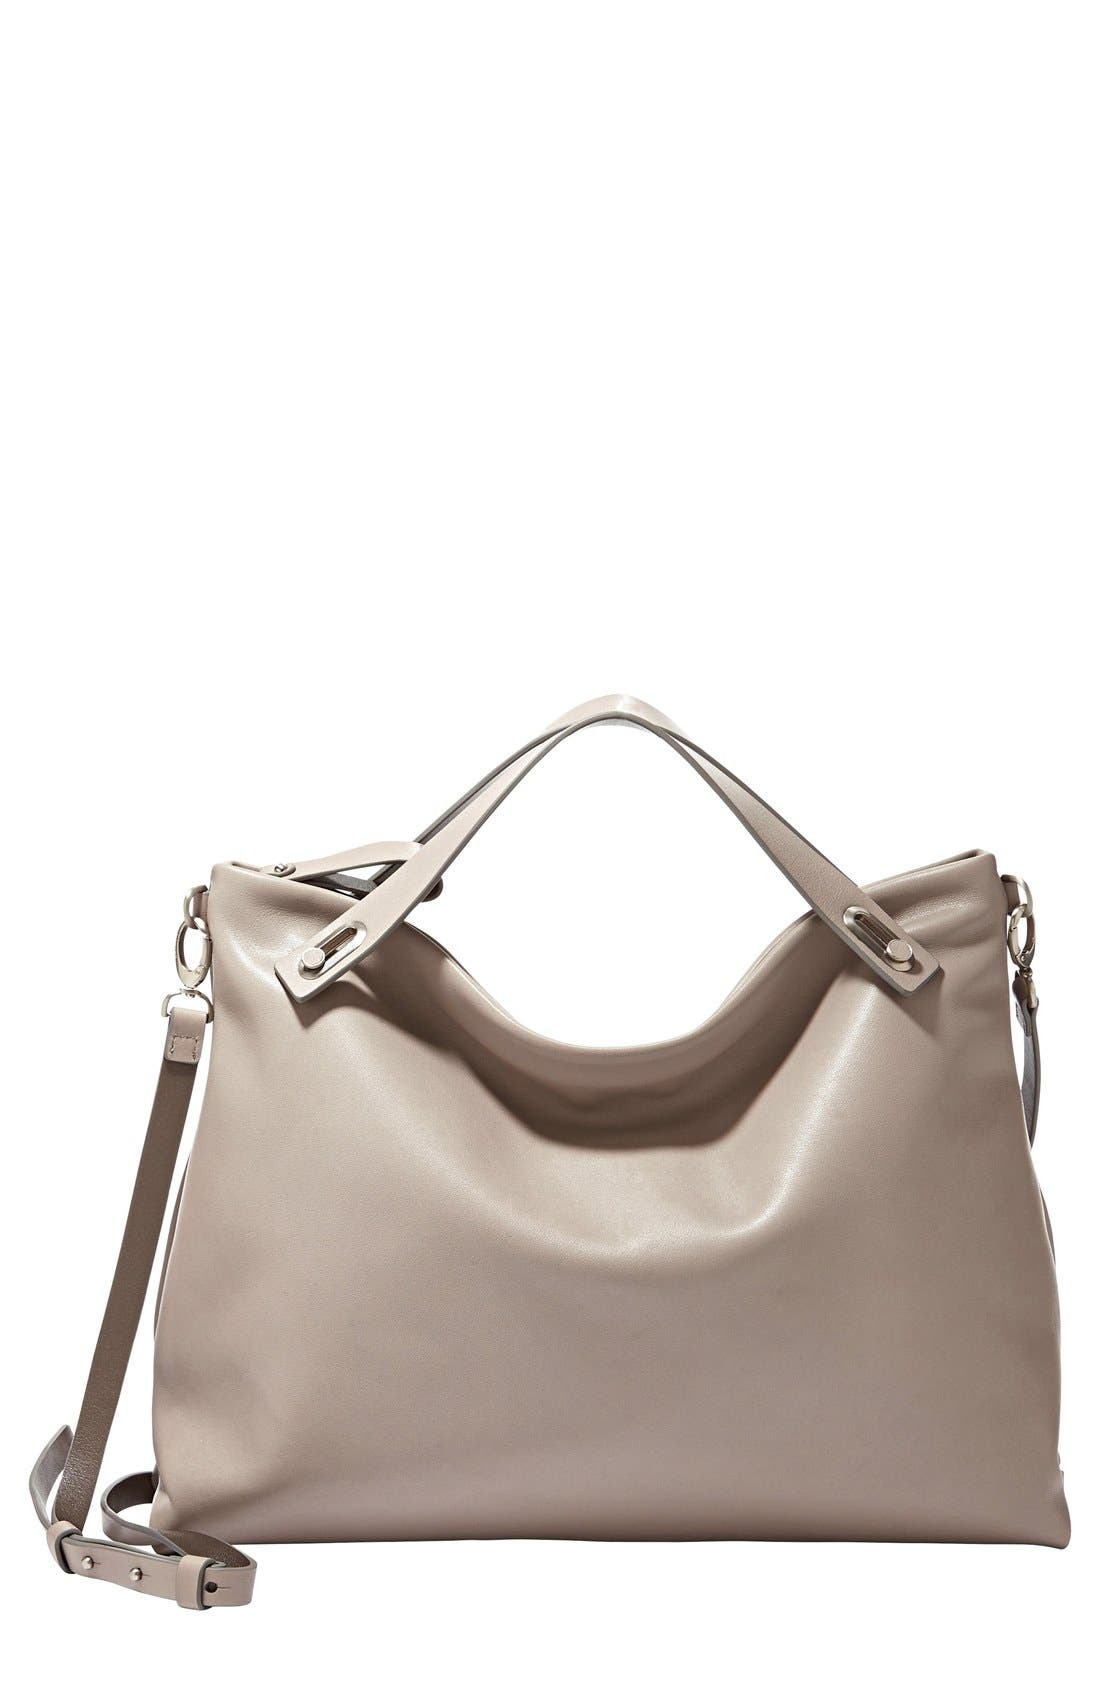 Main Image - Skagen 'Mikkeline' Leather Satchel